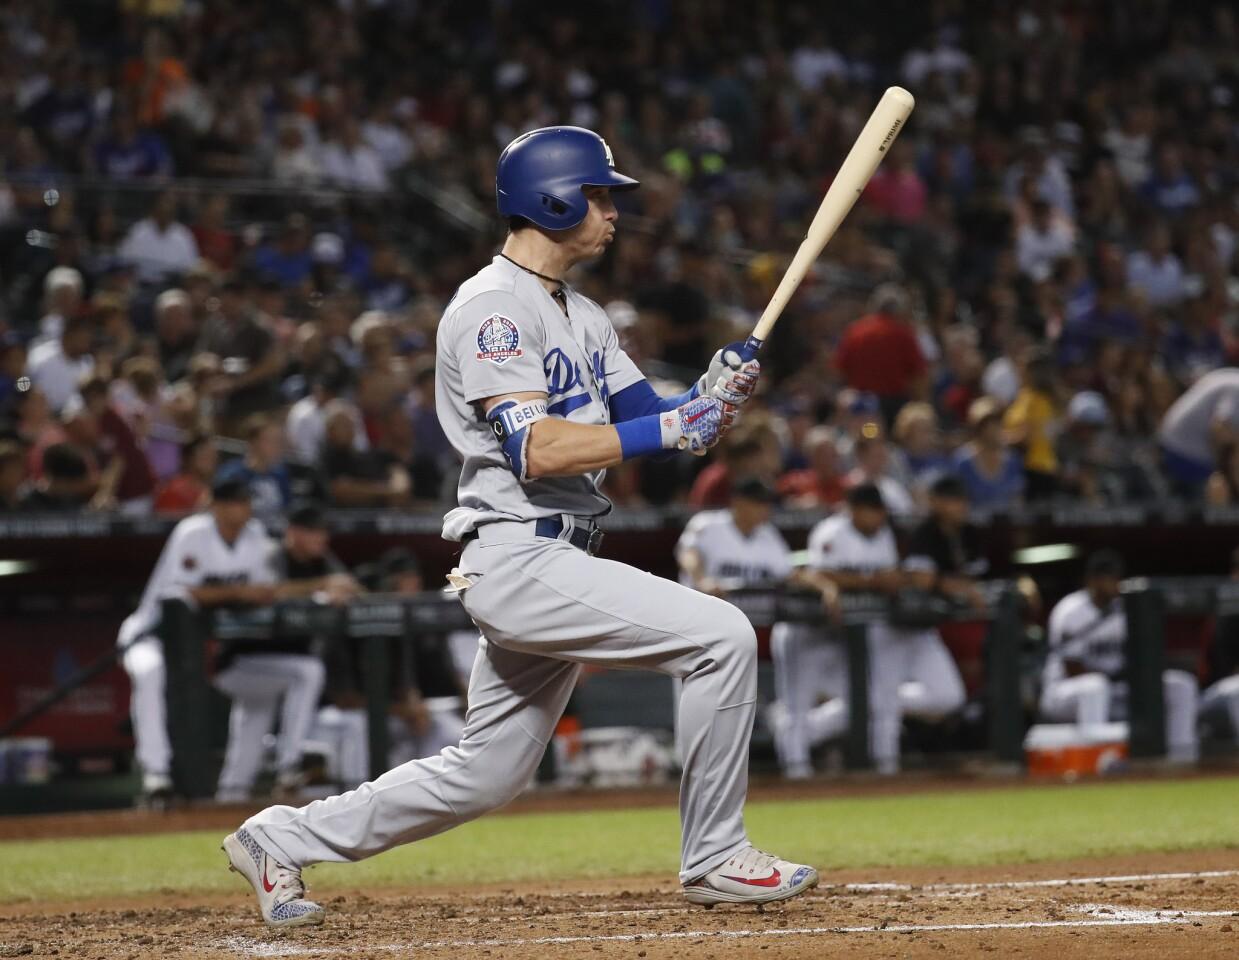 Los Angeles Dodgers first baseman Cody Bellinger hits against the Arizona Diamondbacks during the fifth inning of a baseball game, Tuesday, Sept. 25, 2018, in Phoenix. (AP Photo/Matt York)